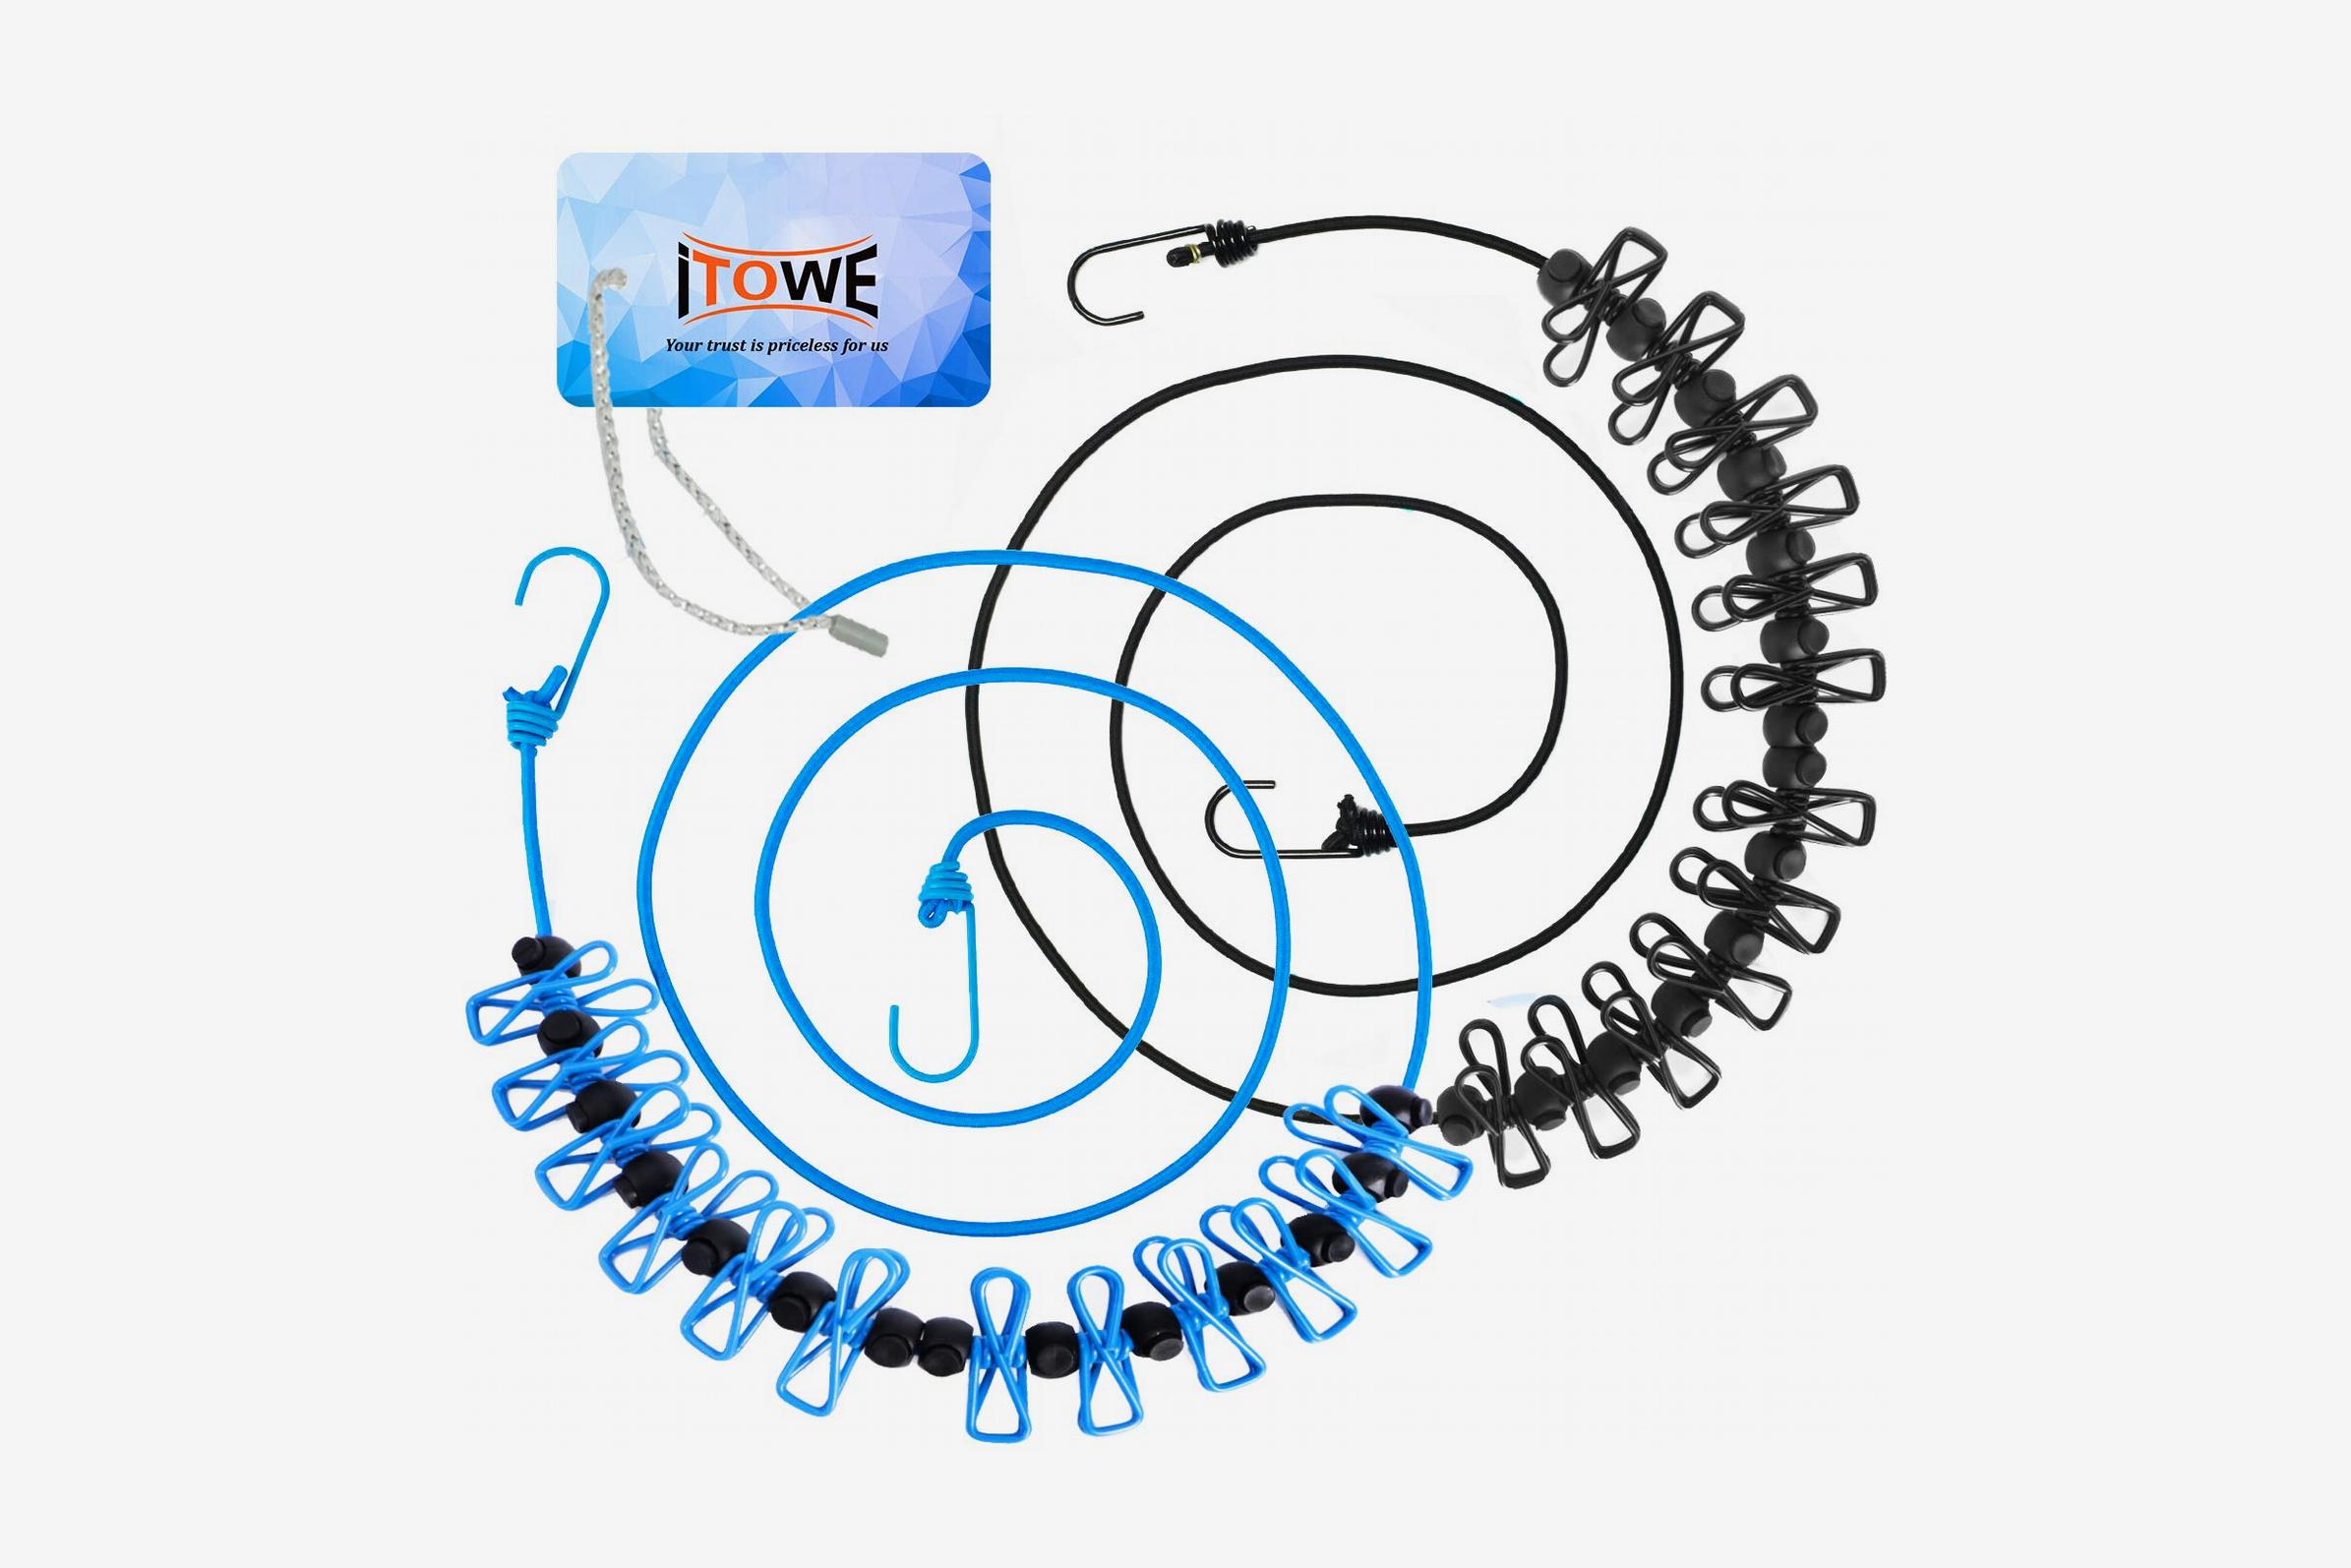 iTOWE Portable Clothesline